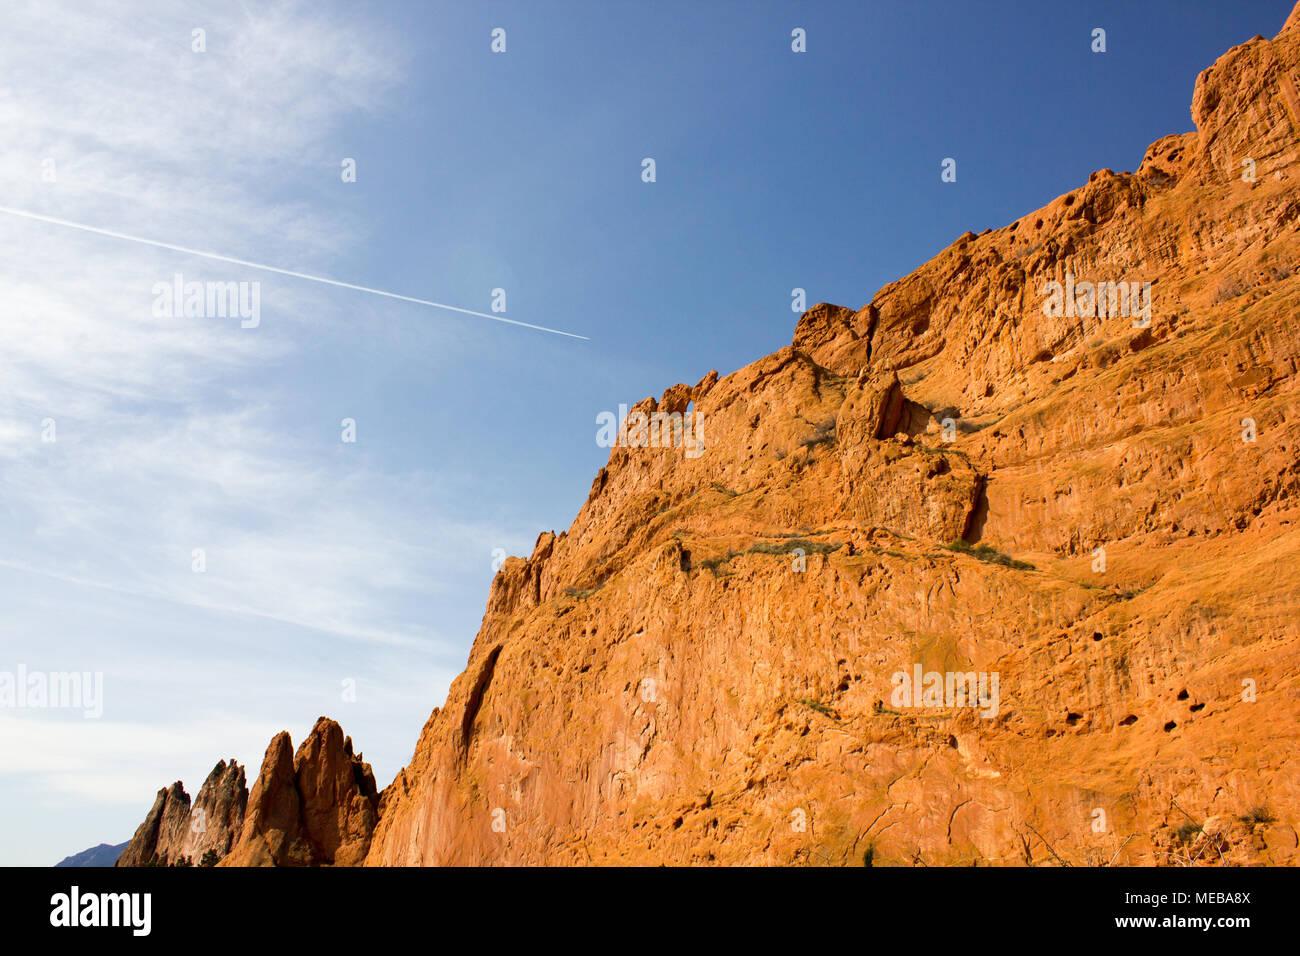 Kissing Camels Rock formation against a bright blue spring sky - Garden of the Gods, Colorado Springs, Colorado - Stock Image